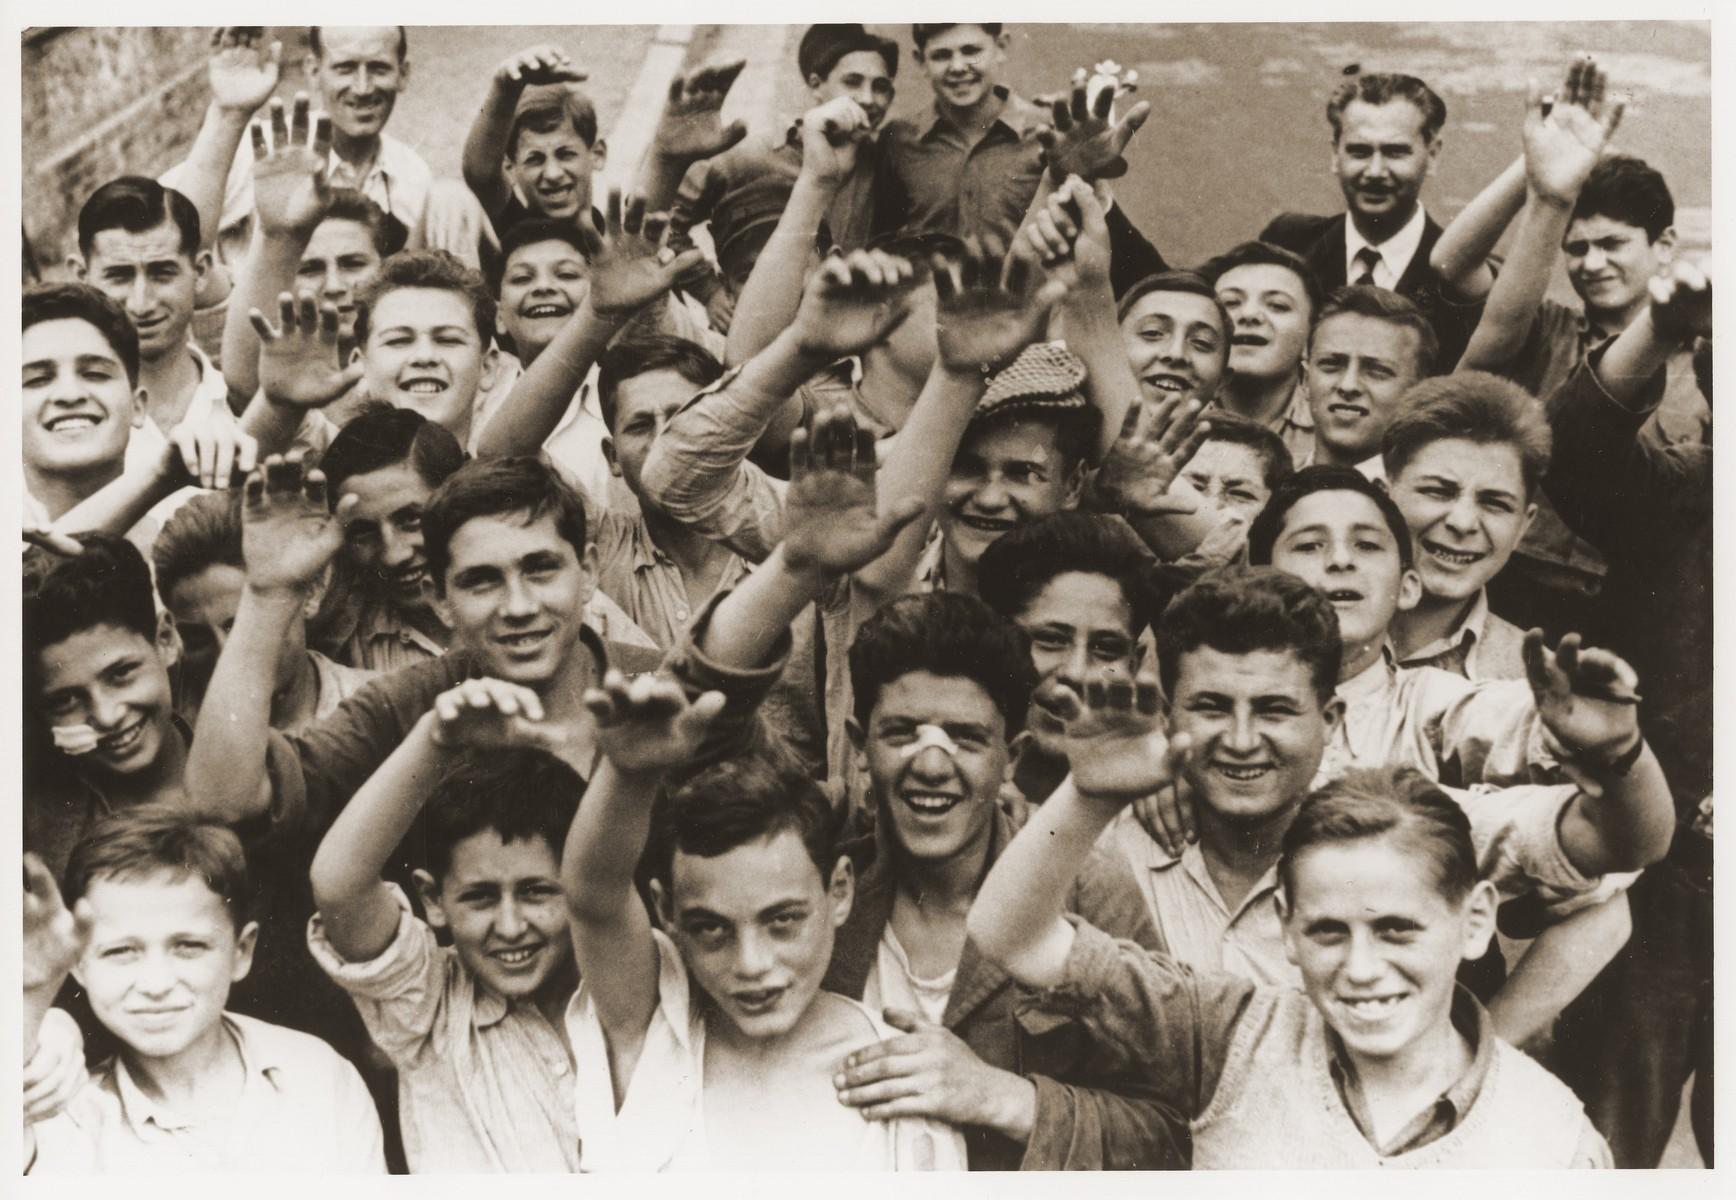 Jewish DP youth who were members of the Buchenwald children's transport wave to the camera at the Ecouis children's home.  Among those pictured are Zysio Abramovicz, Abram Czapnik, Albert Dymant, Joseph Fachler, Léon Frydman, Moritz Freilich, Idek Goldmann, Lejzor Grunberg, Israel Grojsman, Jakob Kapelusz, Mayer Kilsztok, Léon Lewkowicz and Hersch Unger.  [See enclosed sheet for precise identifications.]